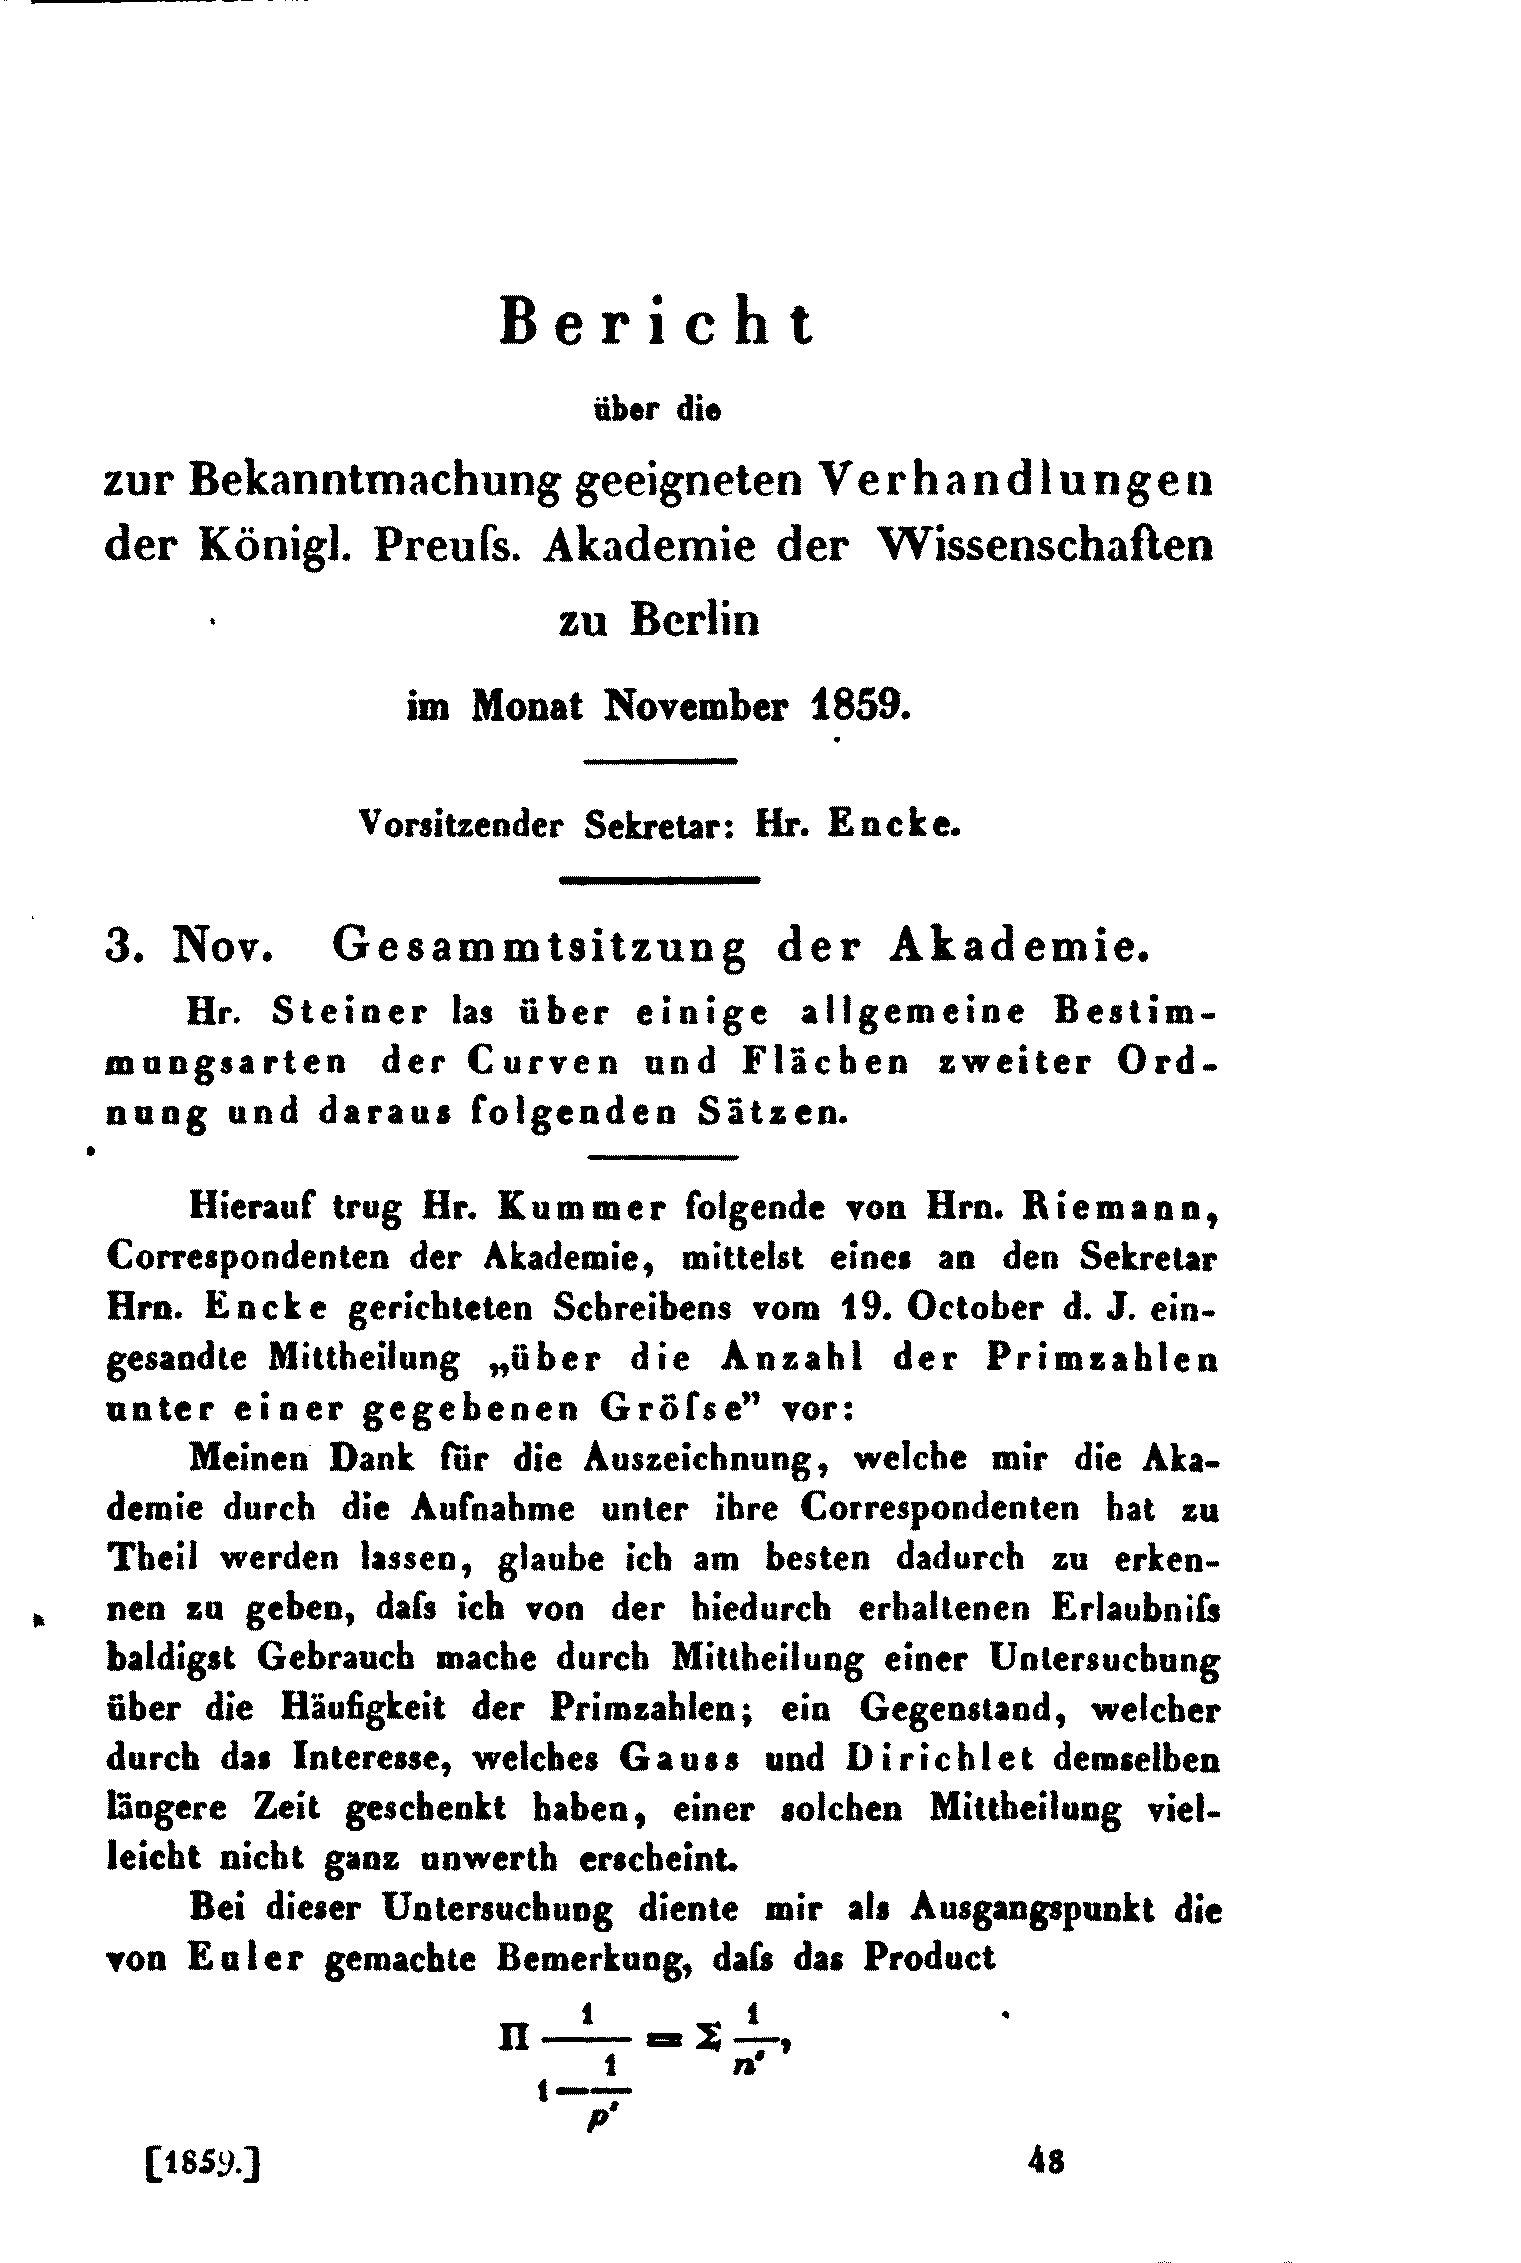 File:RiemannPrim1859.djvu - Wikimedia Commons